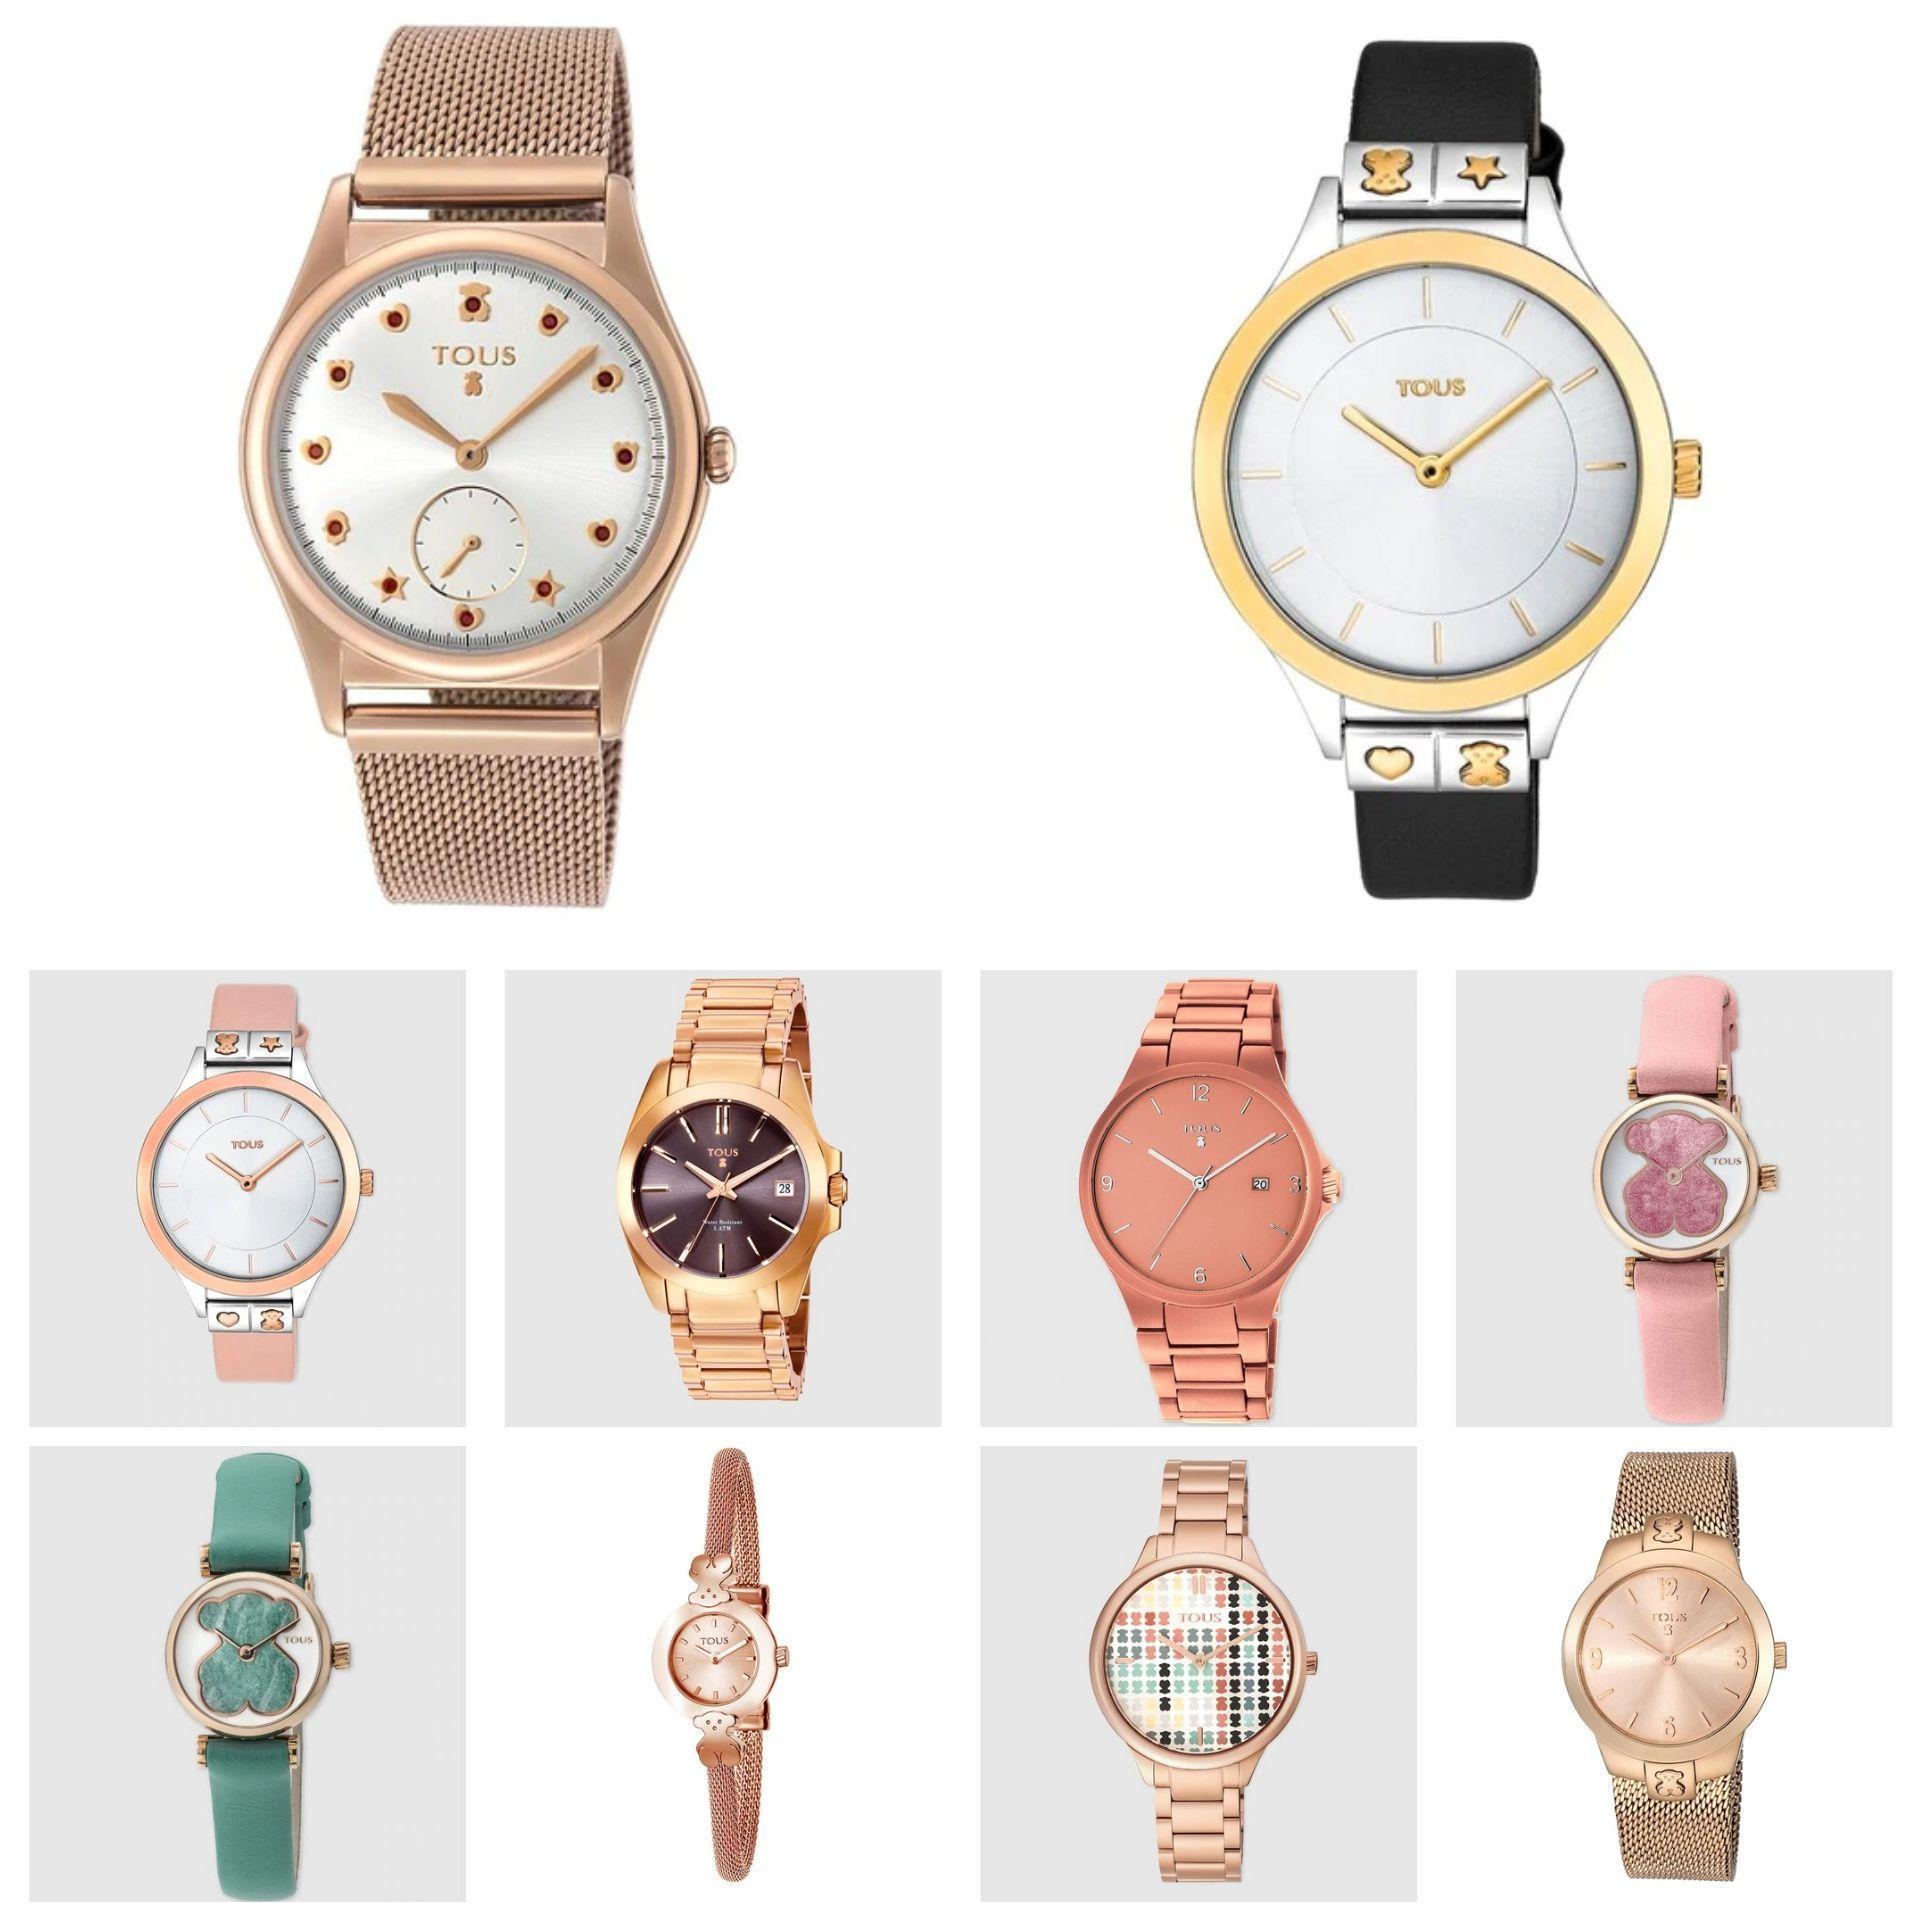 Relojes Tous Mujer con descuento de 64%-69%